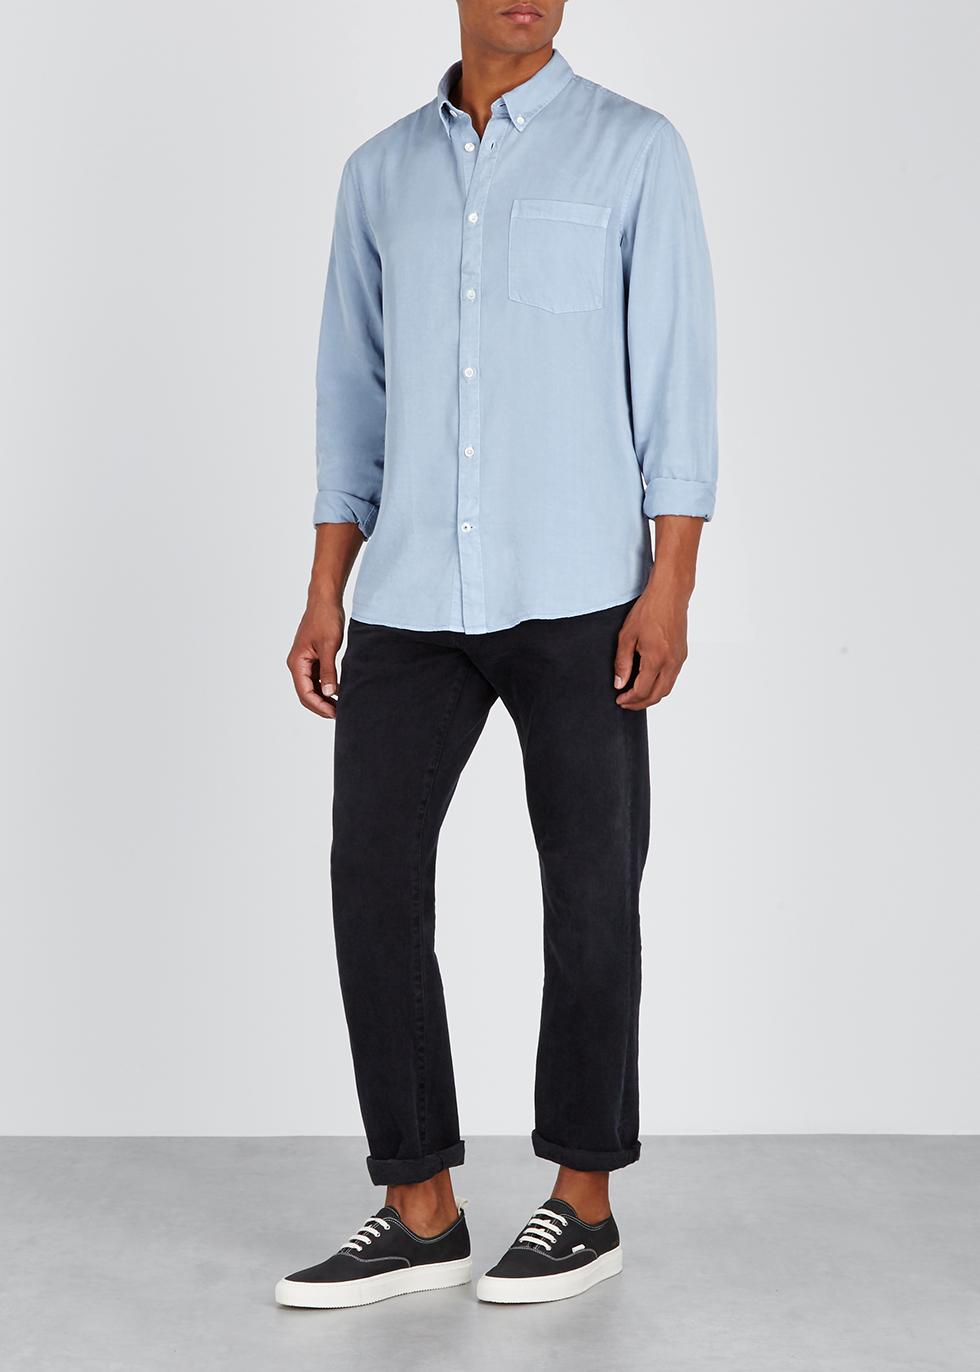 fdc2f42f357 Men s Designer Shirts - Harvey Nichols